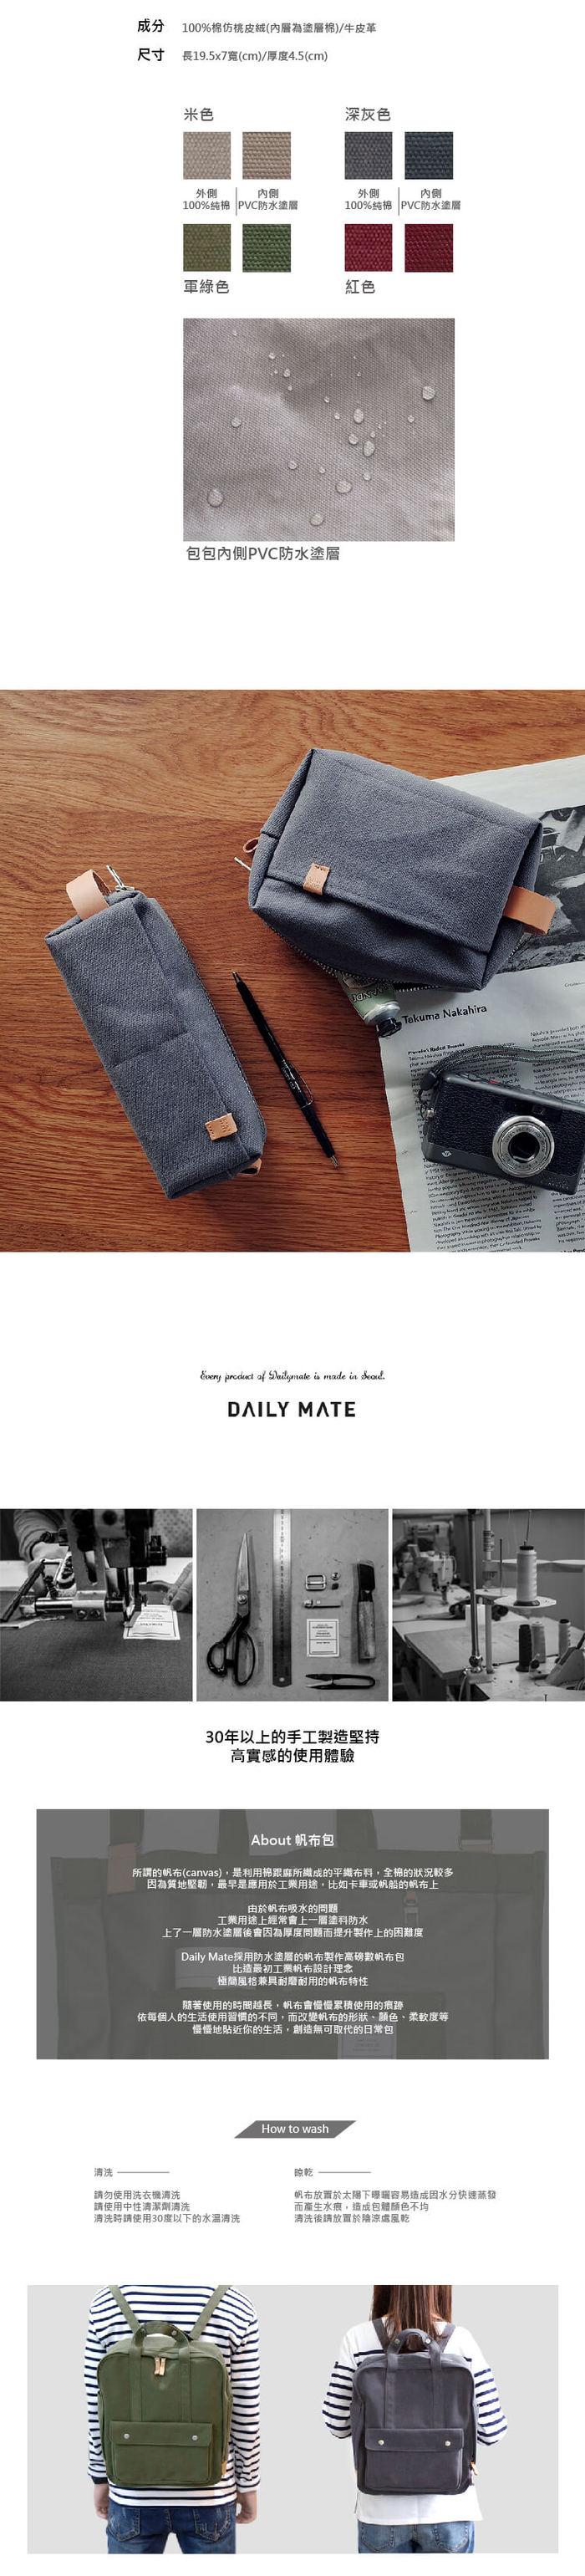 Daily mate|萬用鉛筆包(深灰)